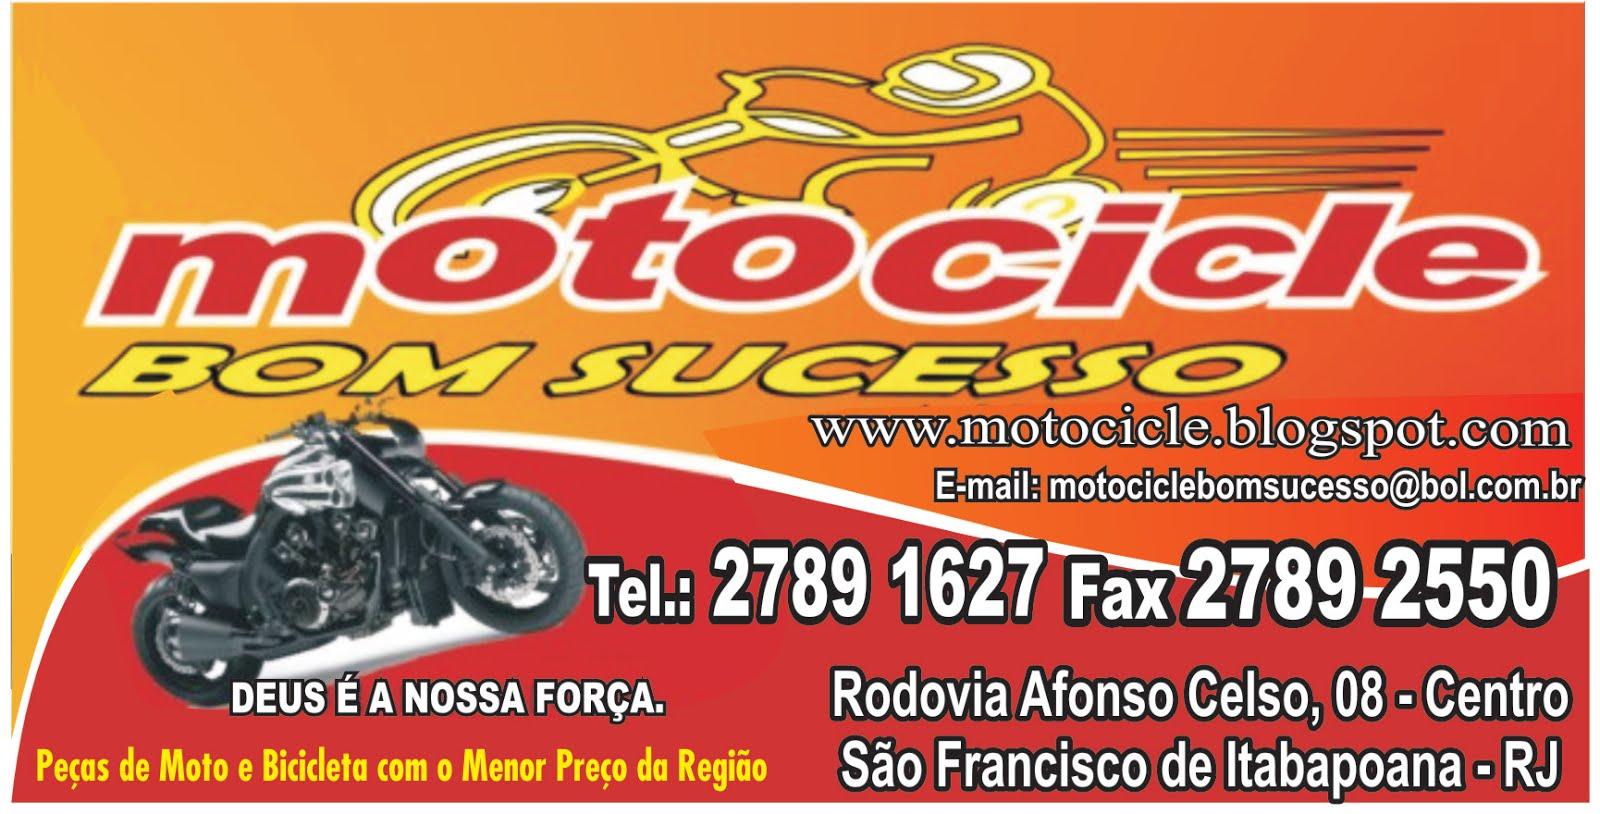 MOTOCICLE BOM SUCESSO